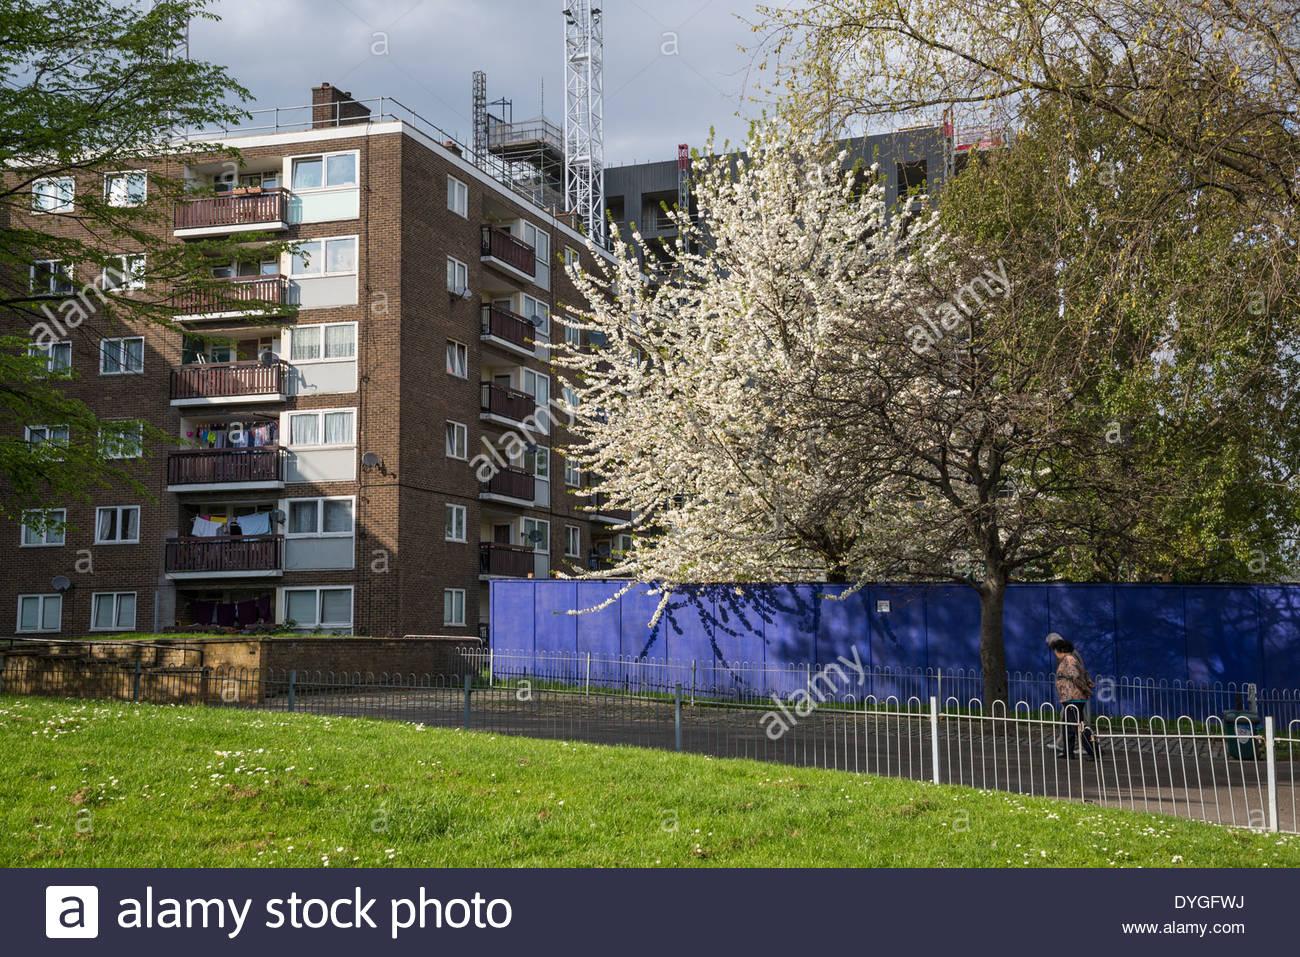 Council housing estate, Bermondsey, Southwark, London, UK - Stock Image